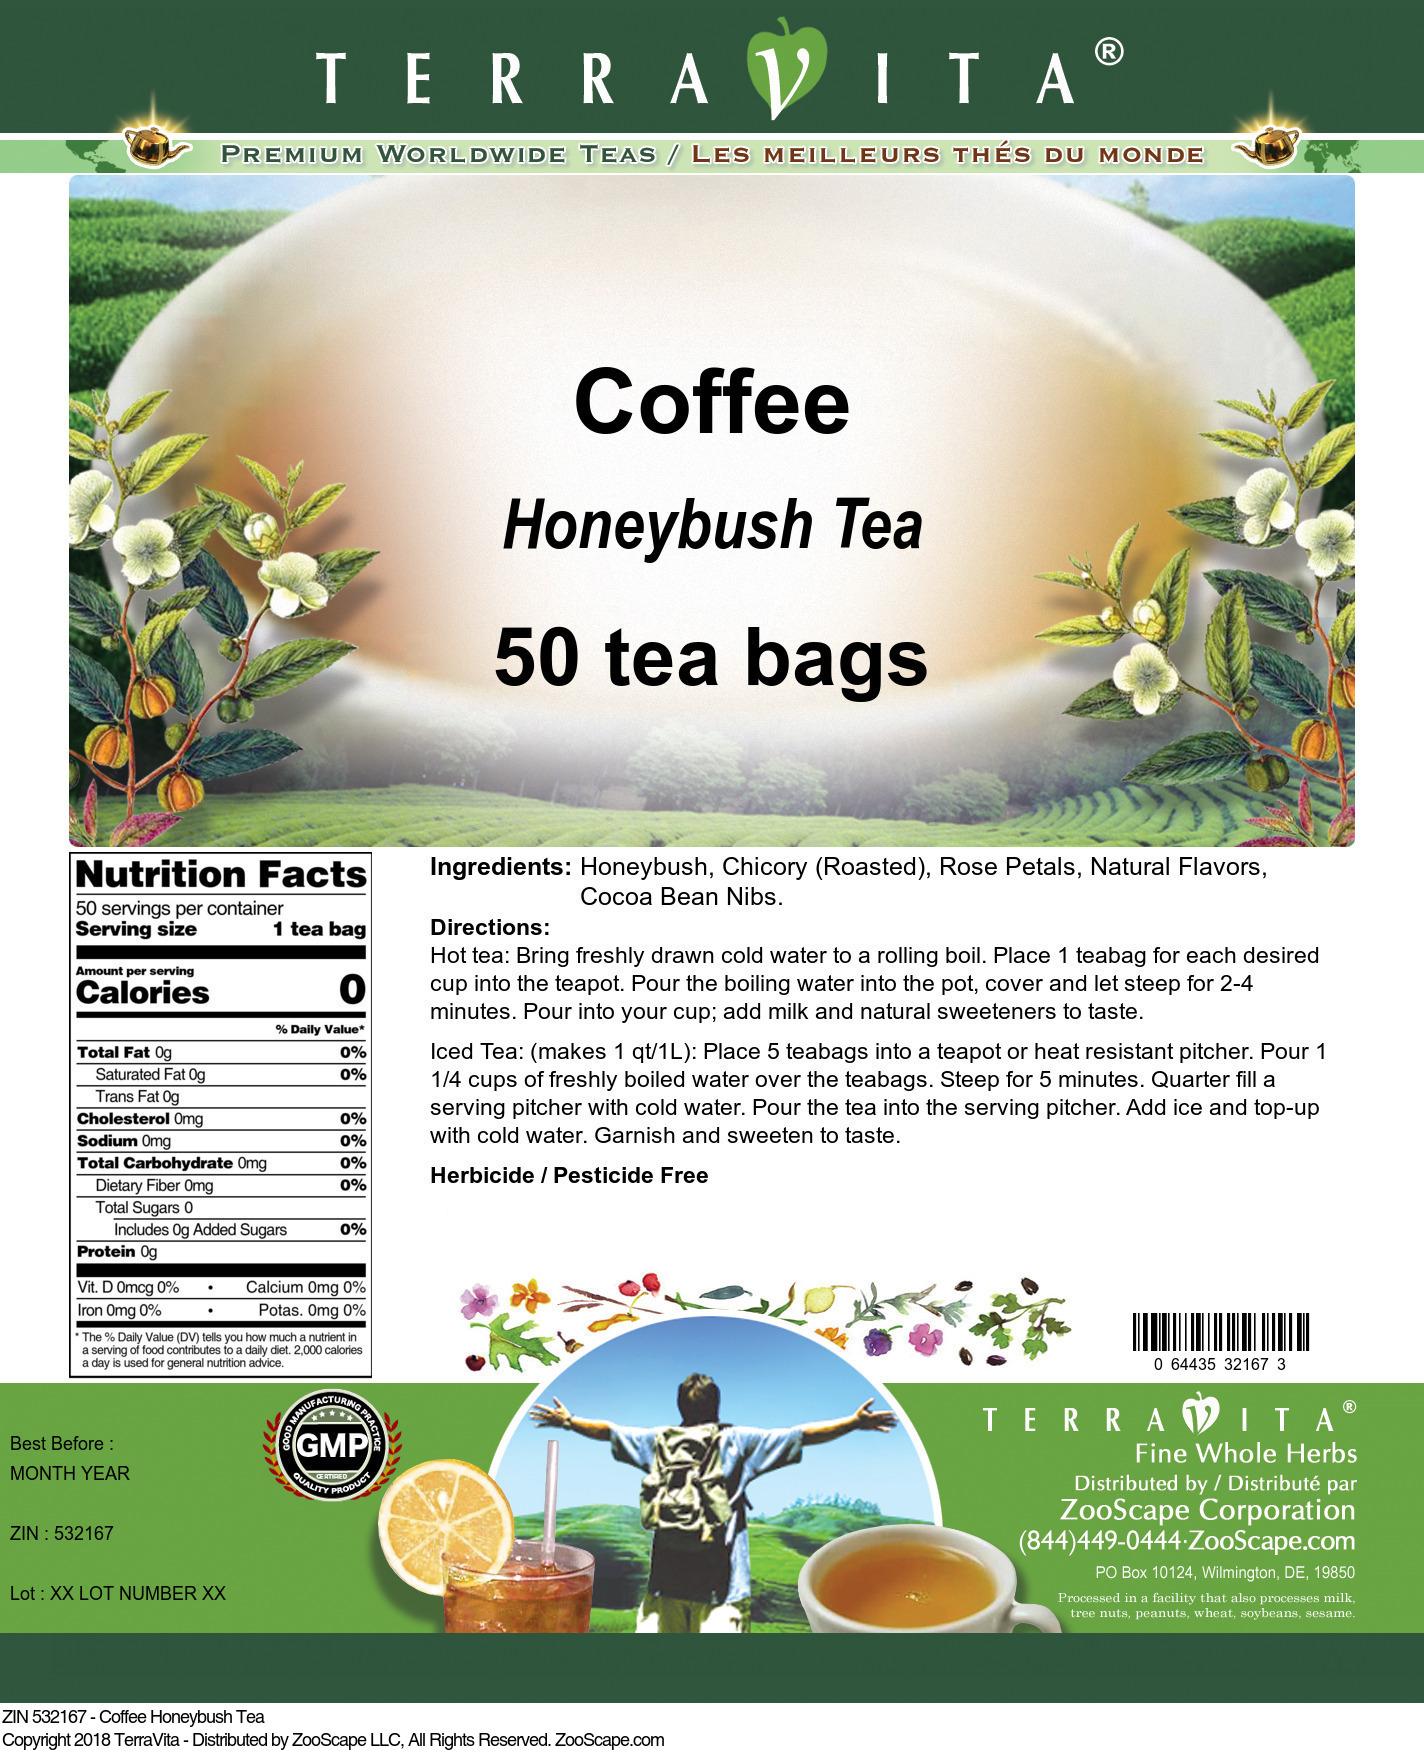 Coffee Honeybush Tea